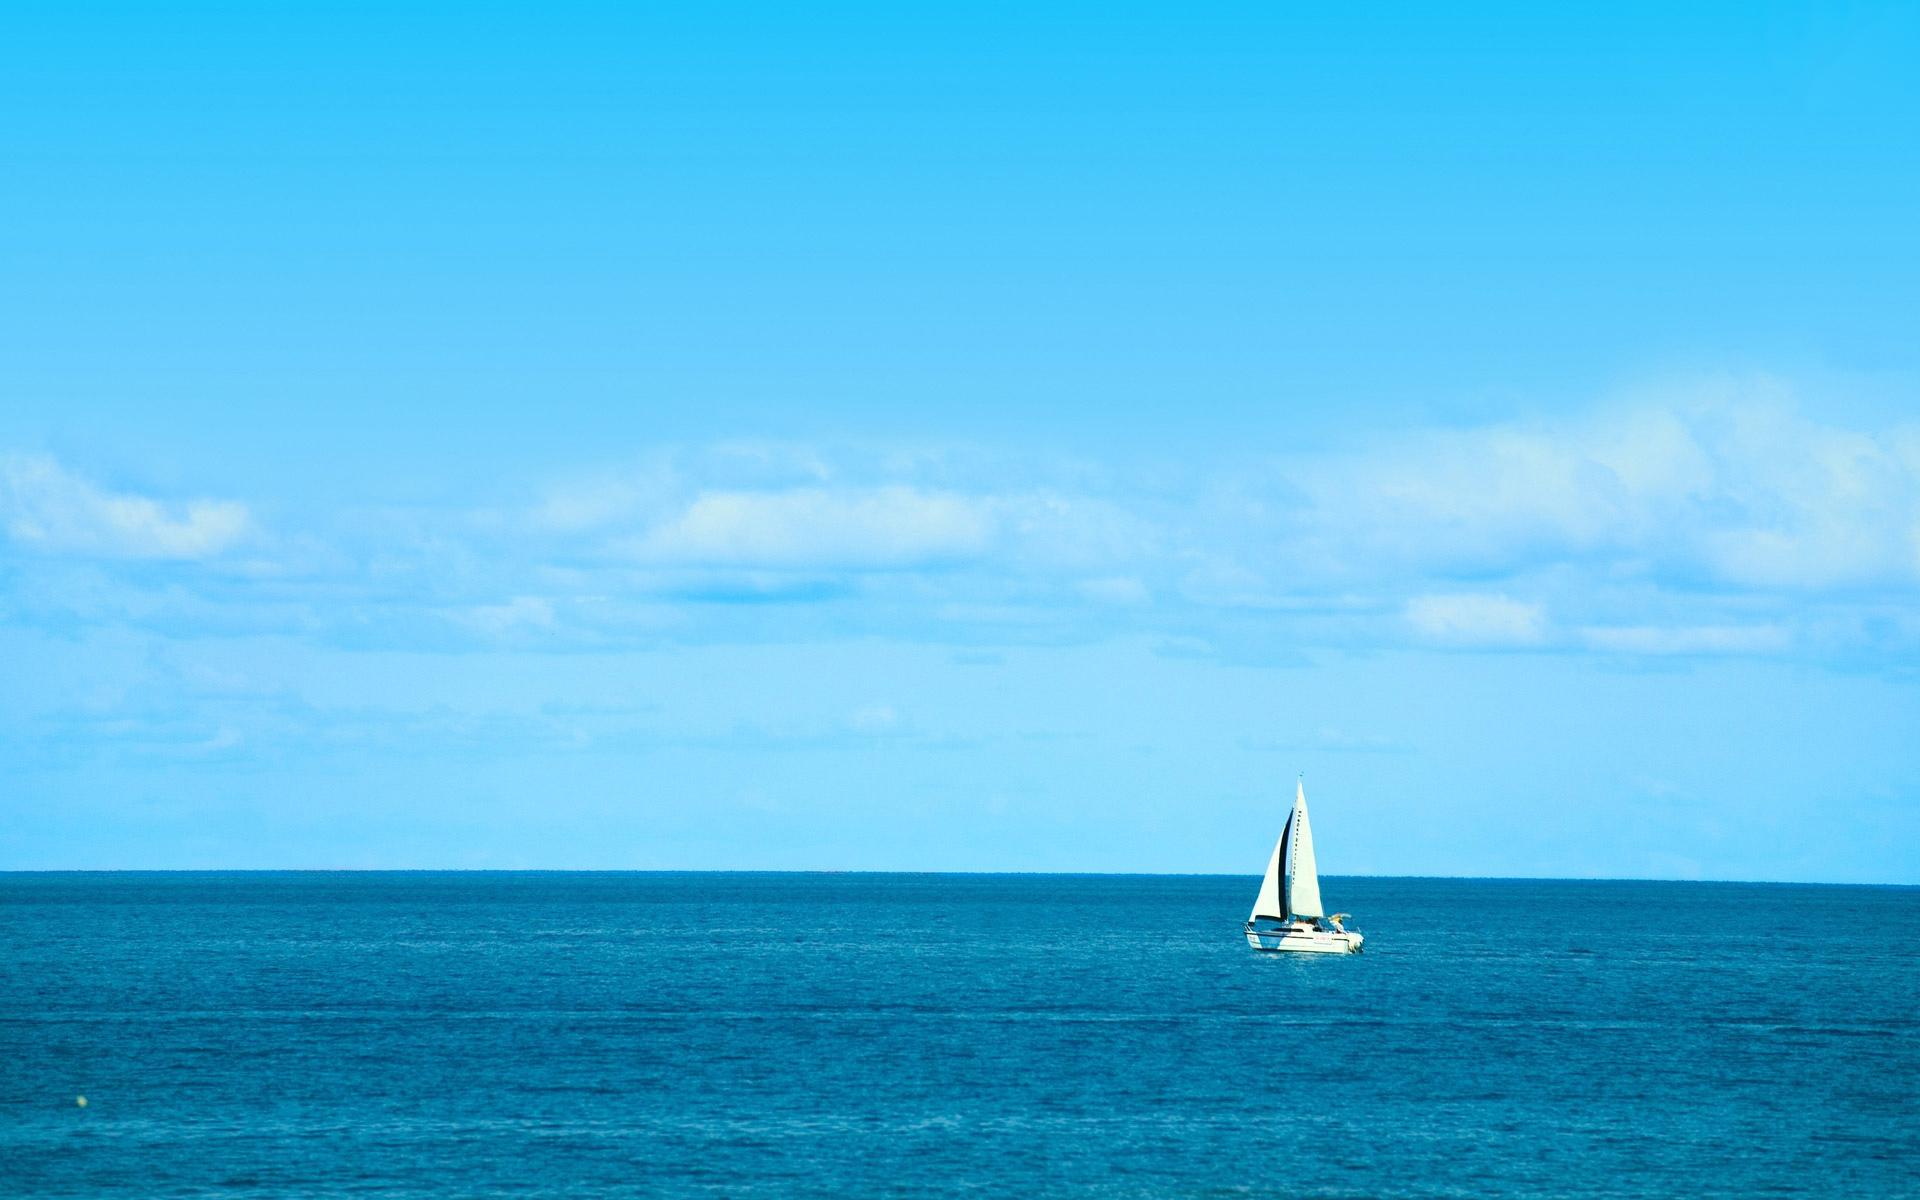 white sailboat on blue ocean beach background beach wallpapers